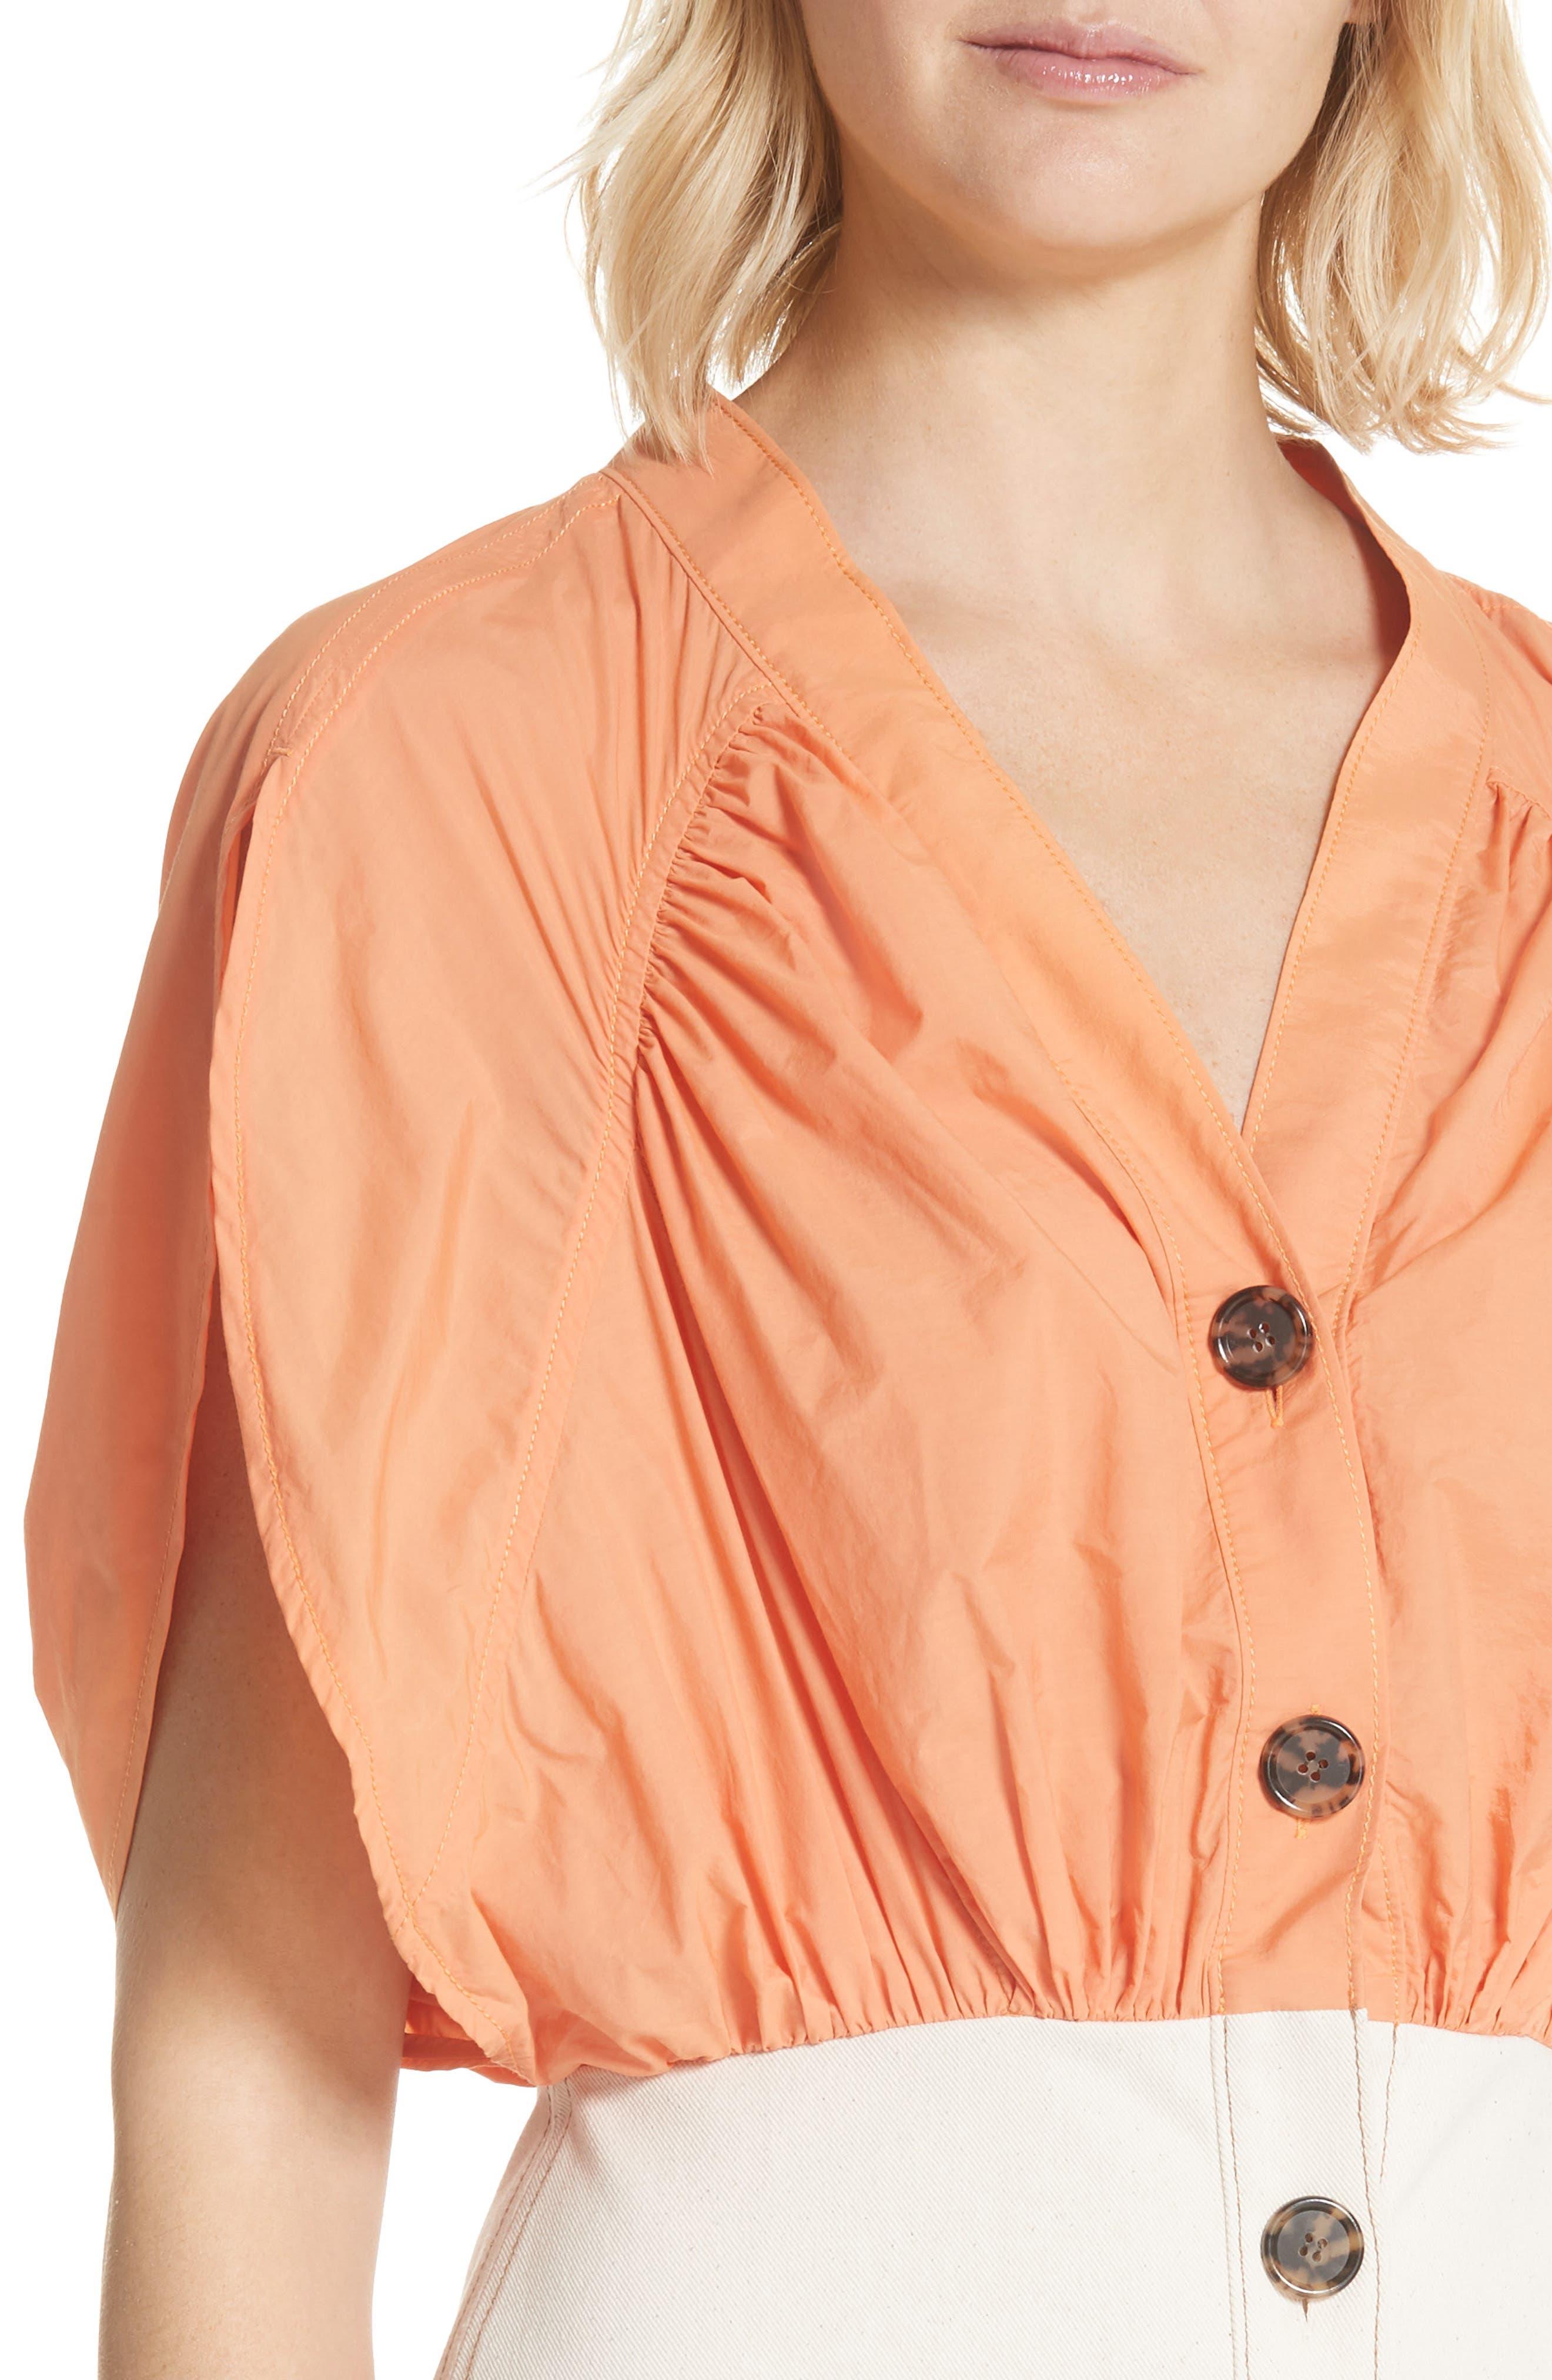 Yana Bicolor Dress,                             Alternate thumbnail 4, color,                             Cotton Orange/ Denim Ecru